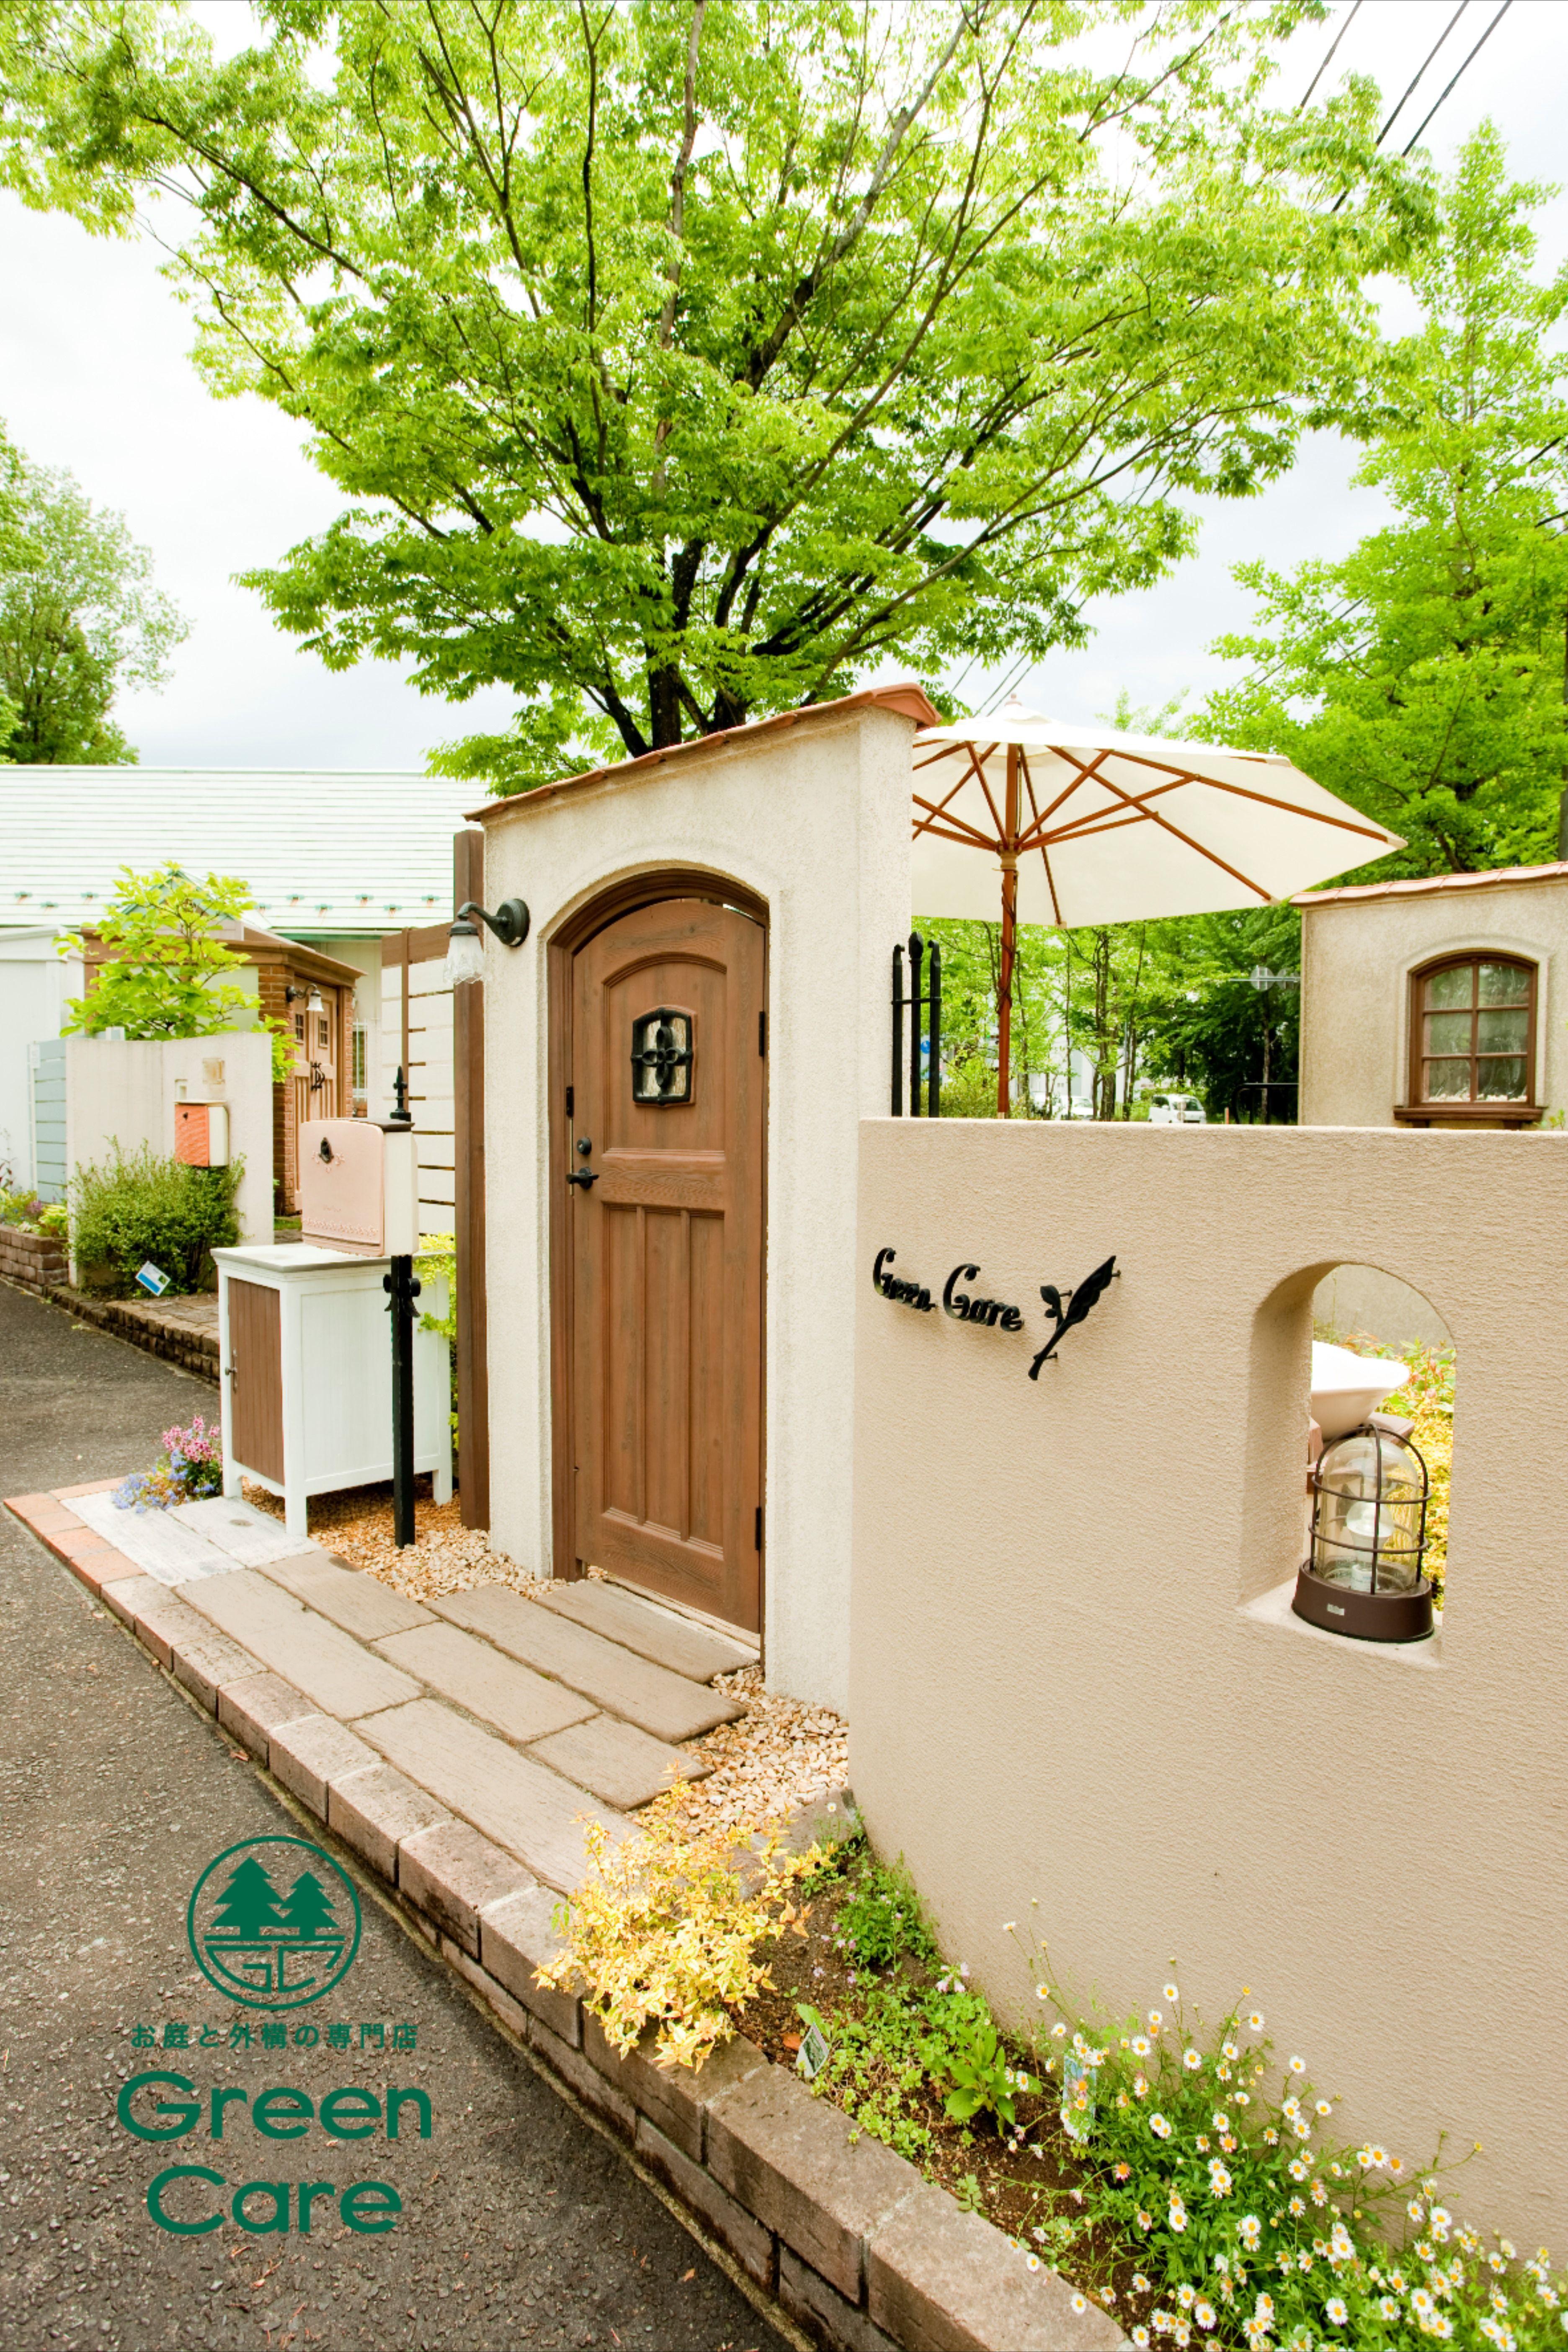 Entrance to the garden with cute door